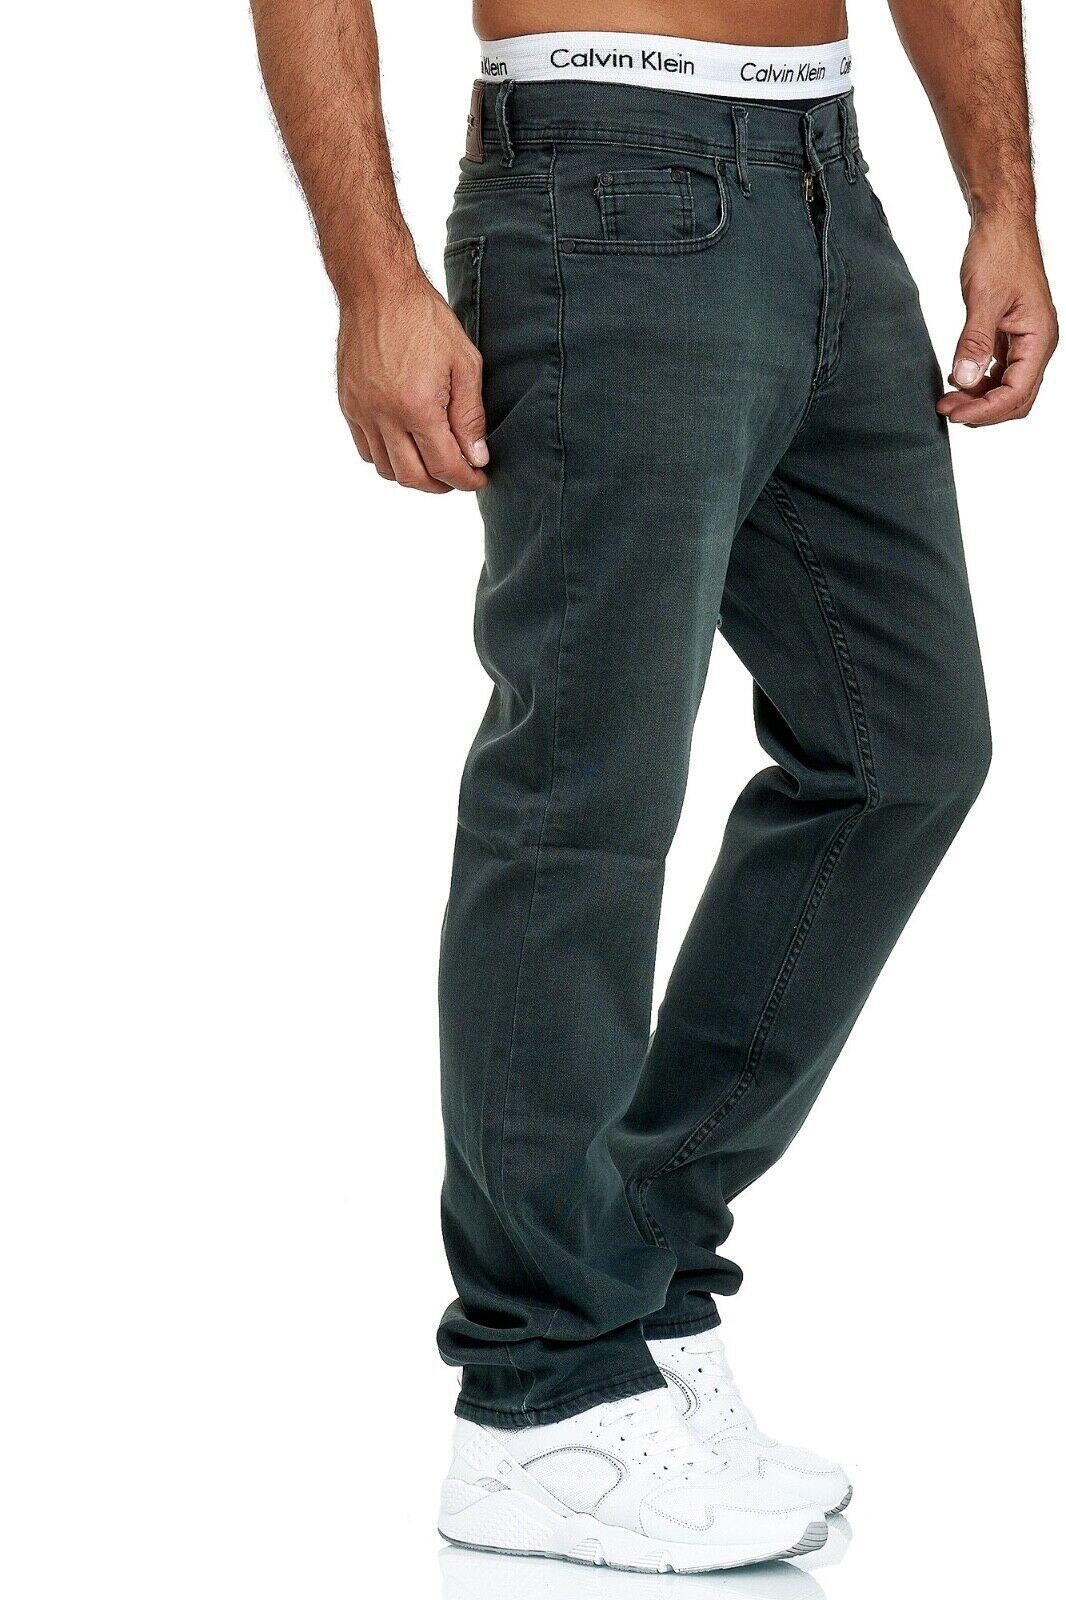 Herren-Jeans-Hose-Denim-KC-Black-Washed-Straight-Cut-Regular-Dicke-Naht-naehte Indexbild 48